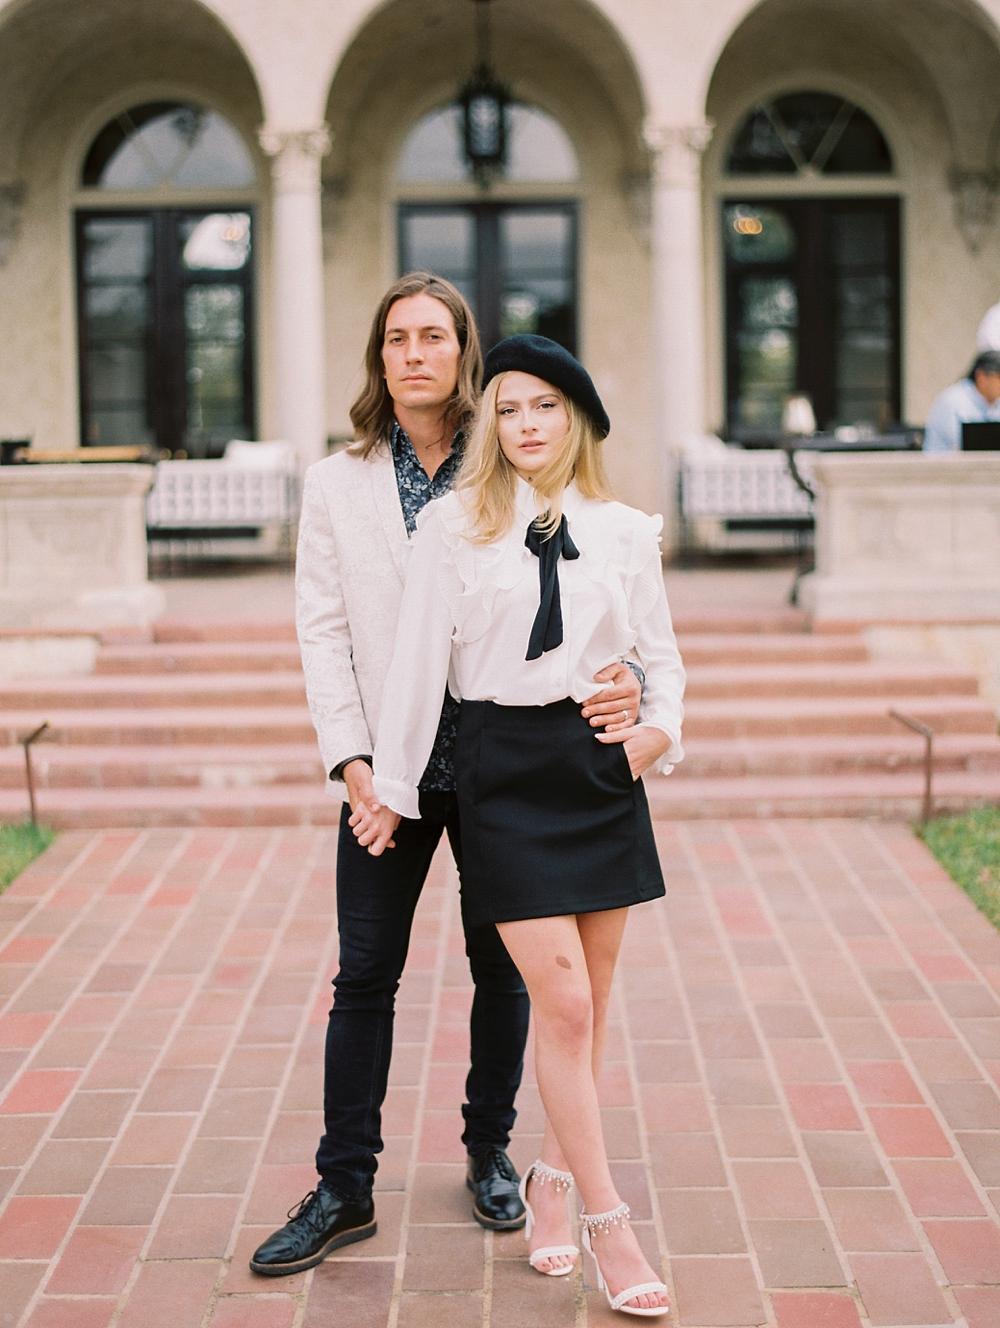 kristin-la-voie-photography-Austin-Wedding-Boudoir-Photographer-Commodore-Perry-Estate-76